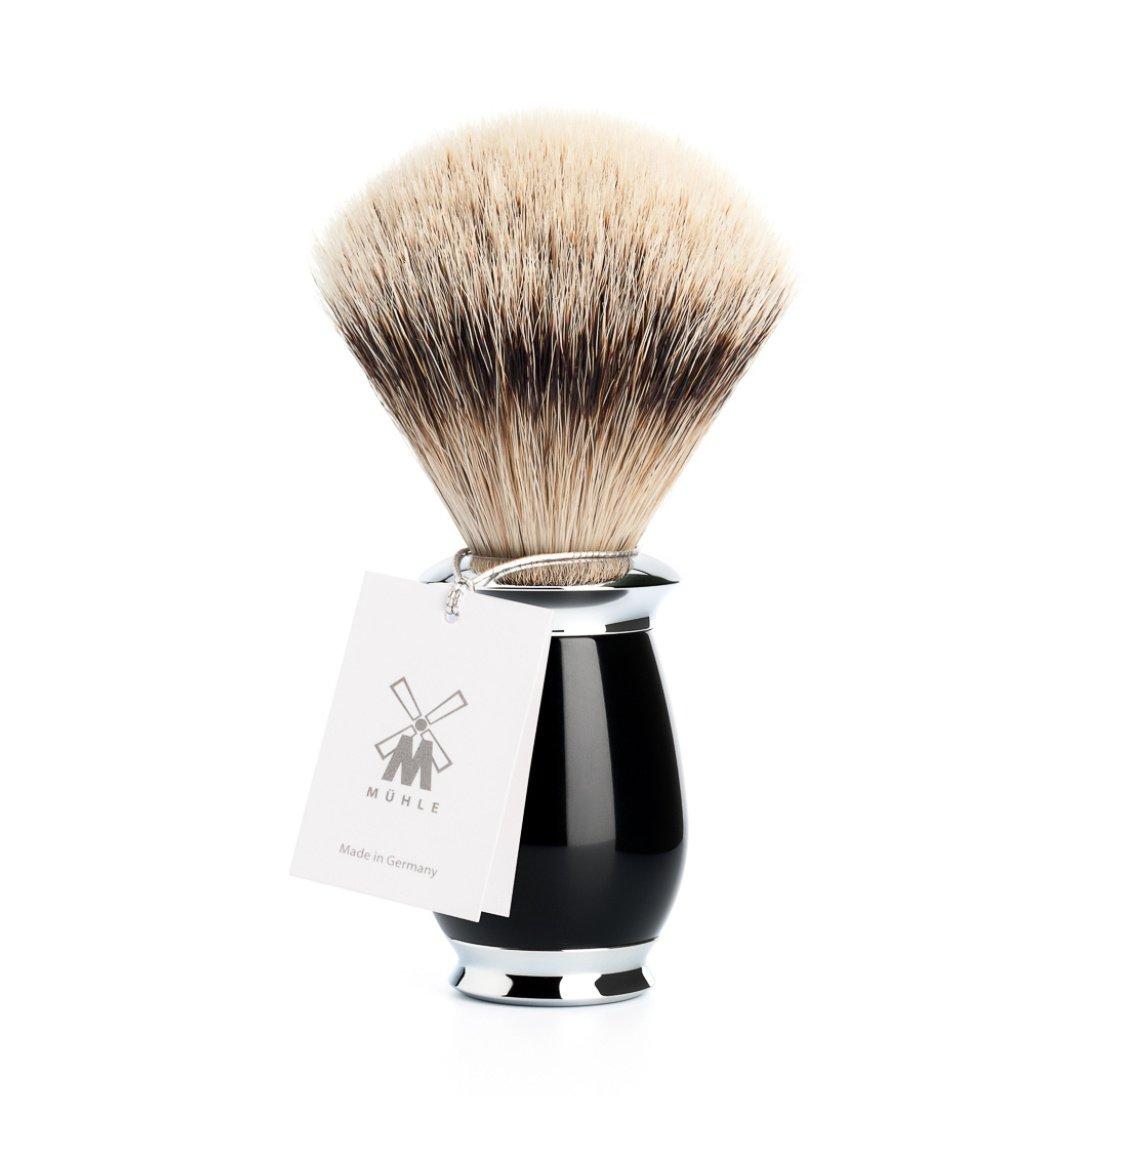 Muhle Purist Silvertip Badger Brush